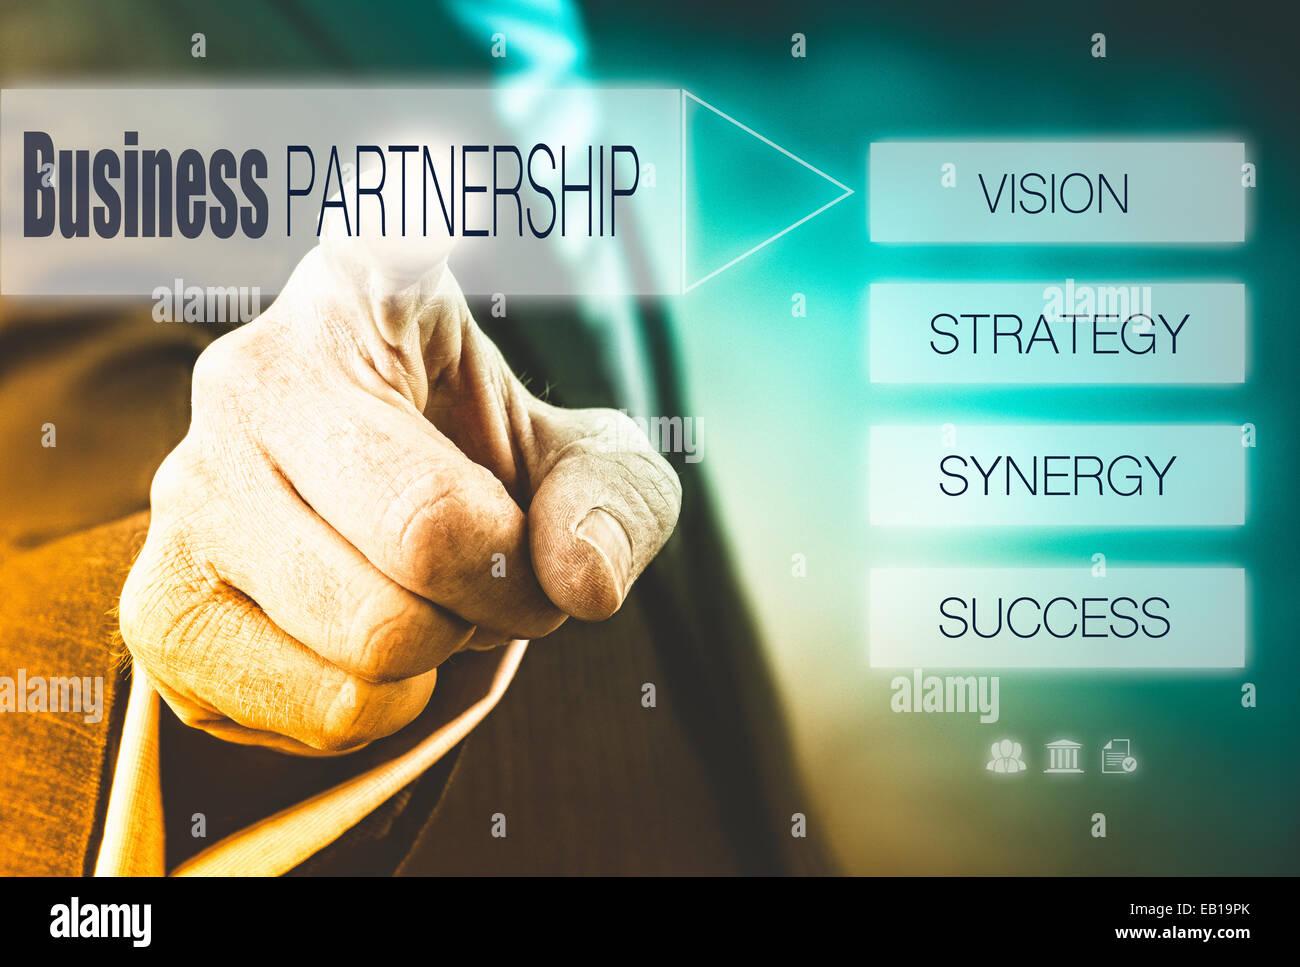 Geschäftsmann auf Knopfdruck Partnerschaft Konzept. Stockbild